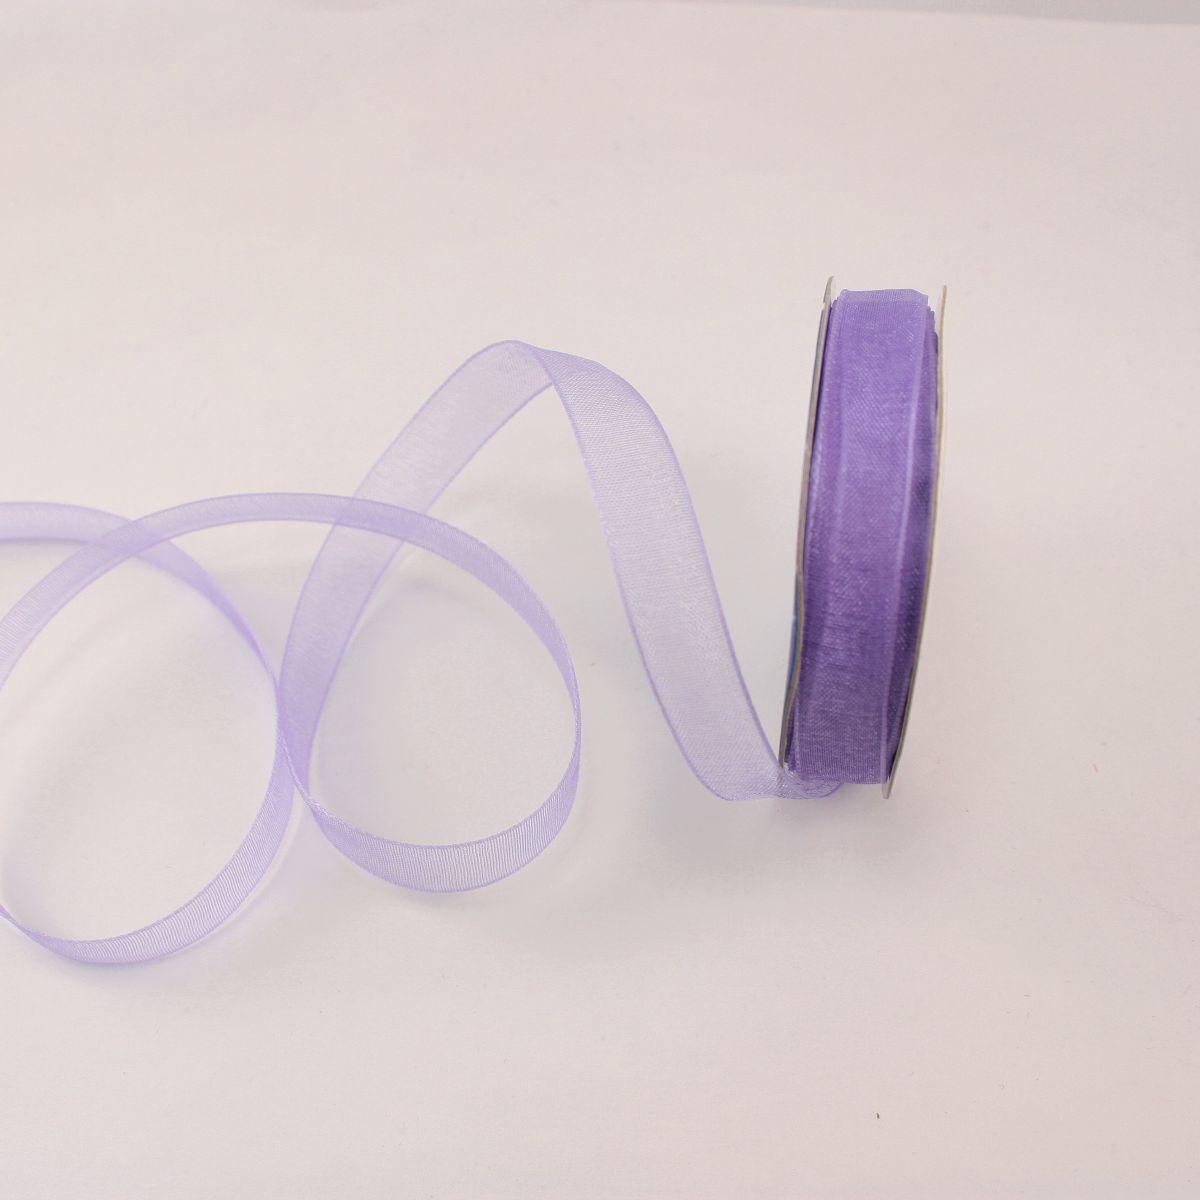 Ruban organdi en bobine lavande 9 mm